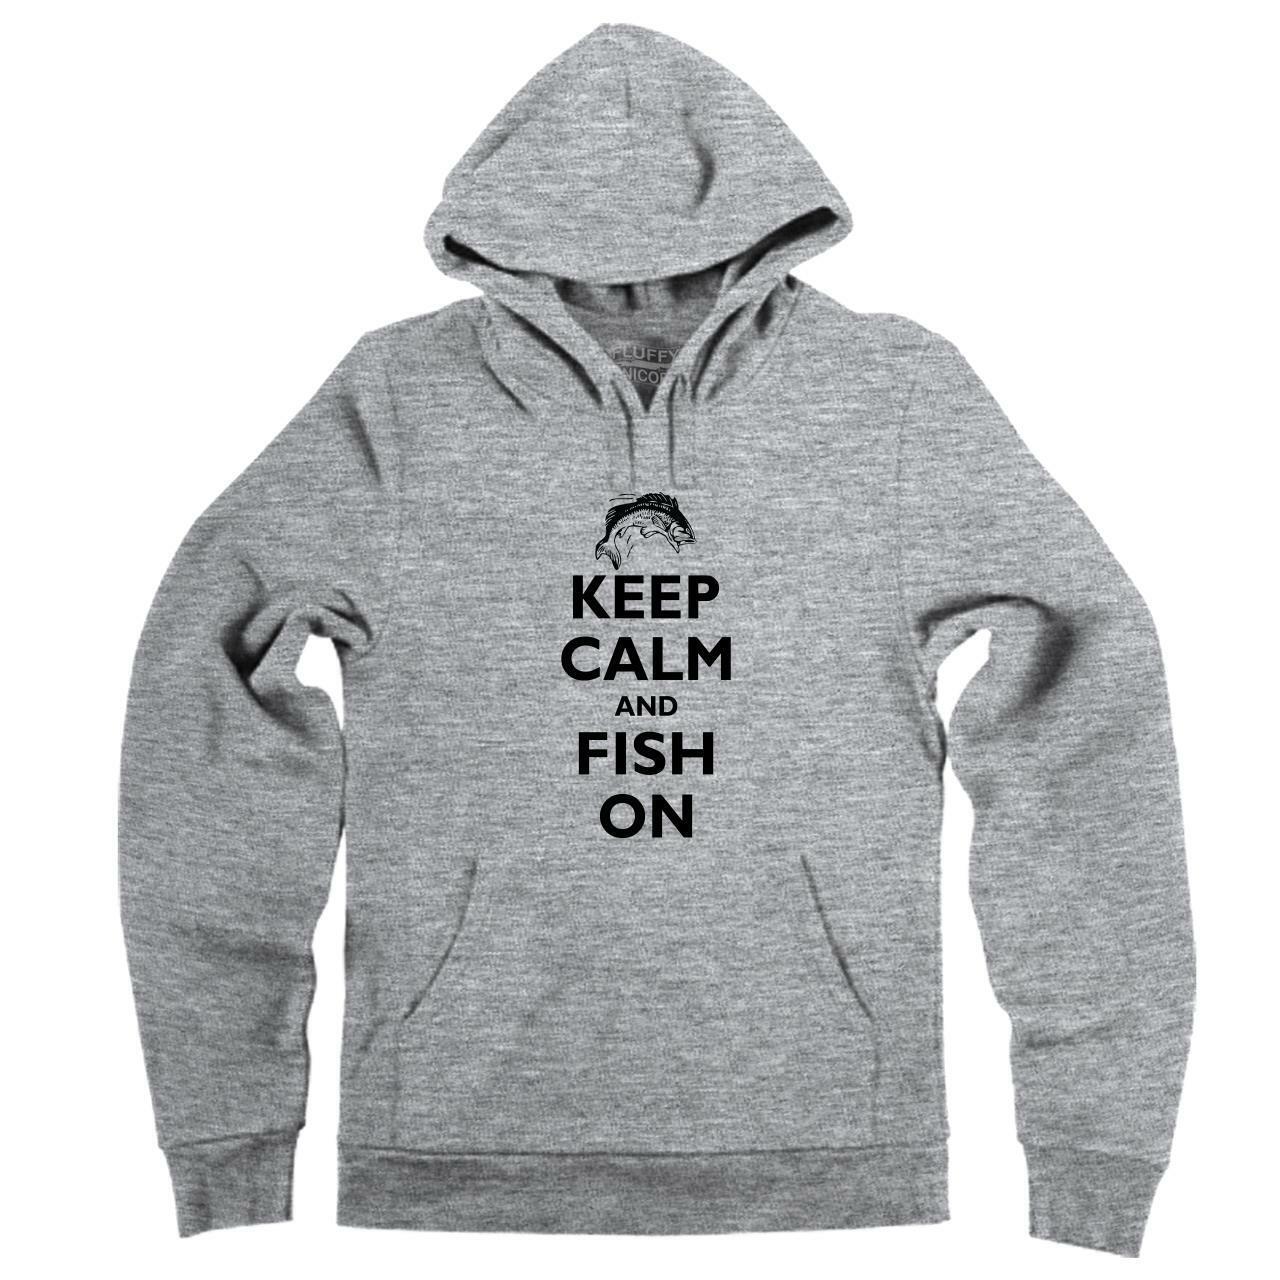 Keep Calm And FISH ON Funny Fishing Hunting Fly Salmon Bass Hoodie Sweatshirt